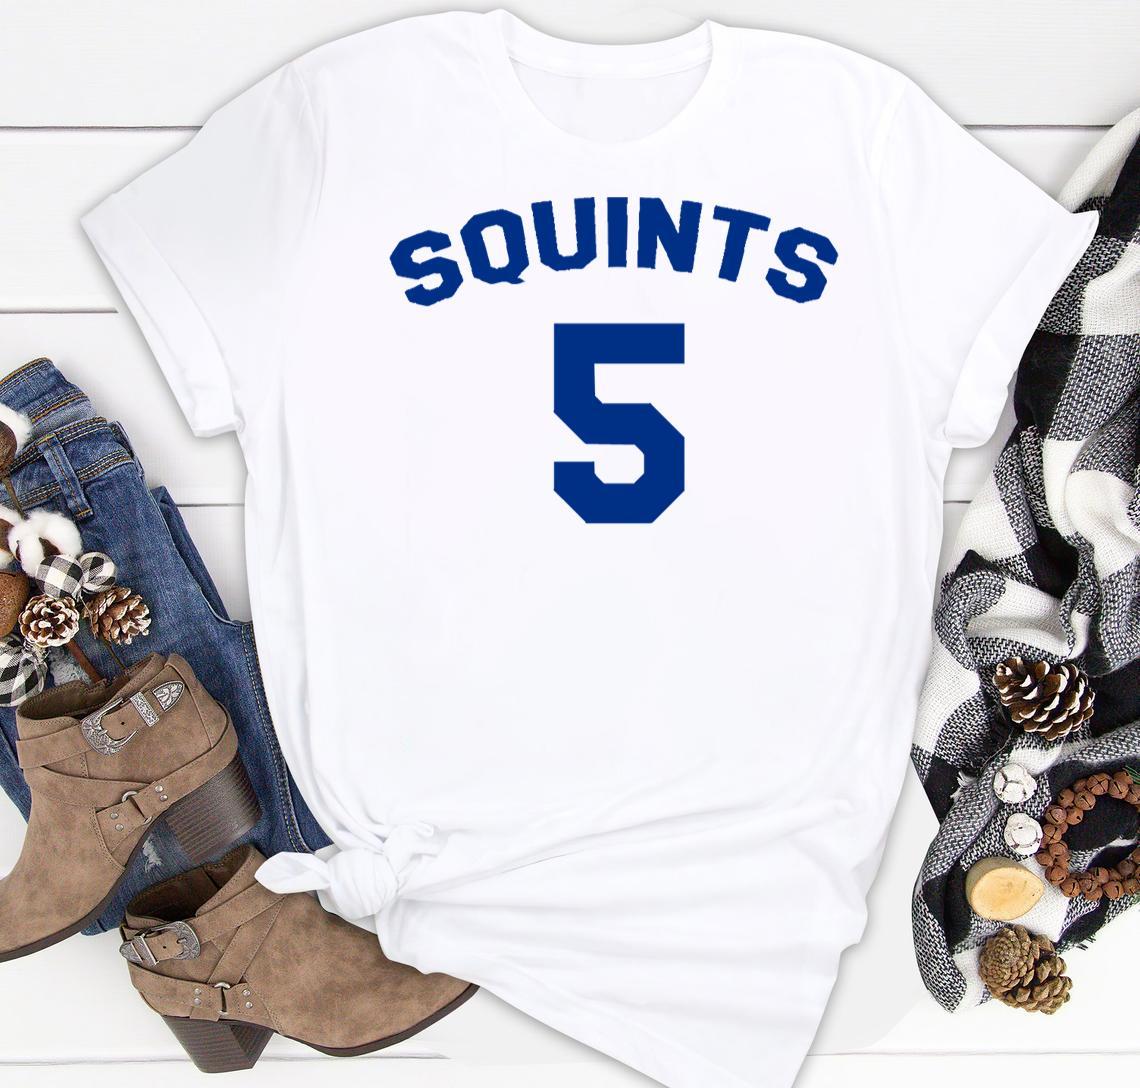 the sandlot squints jersey classic shirt